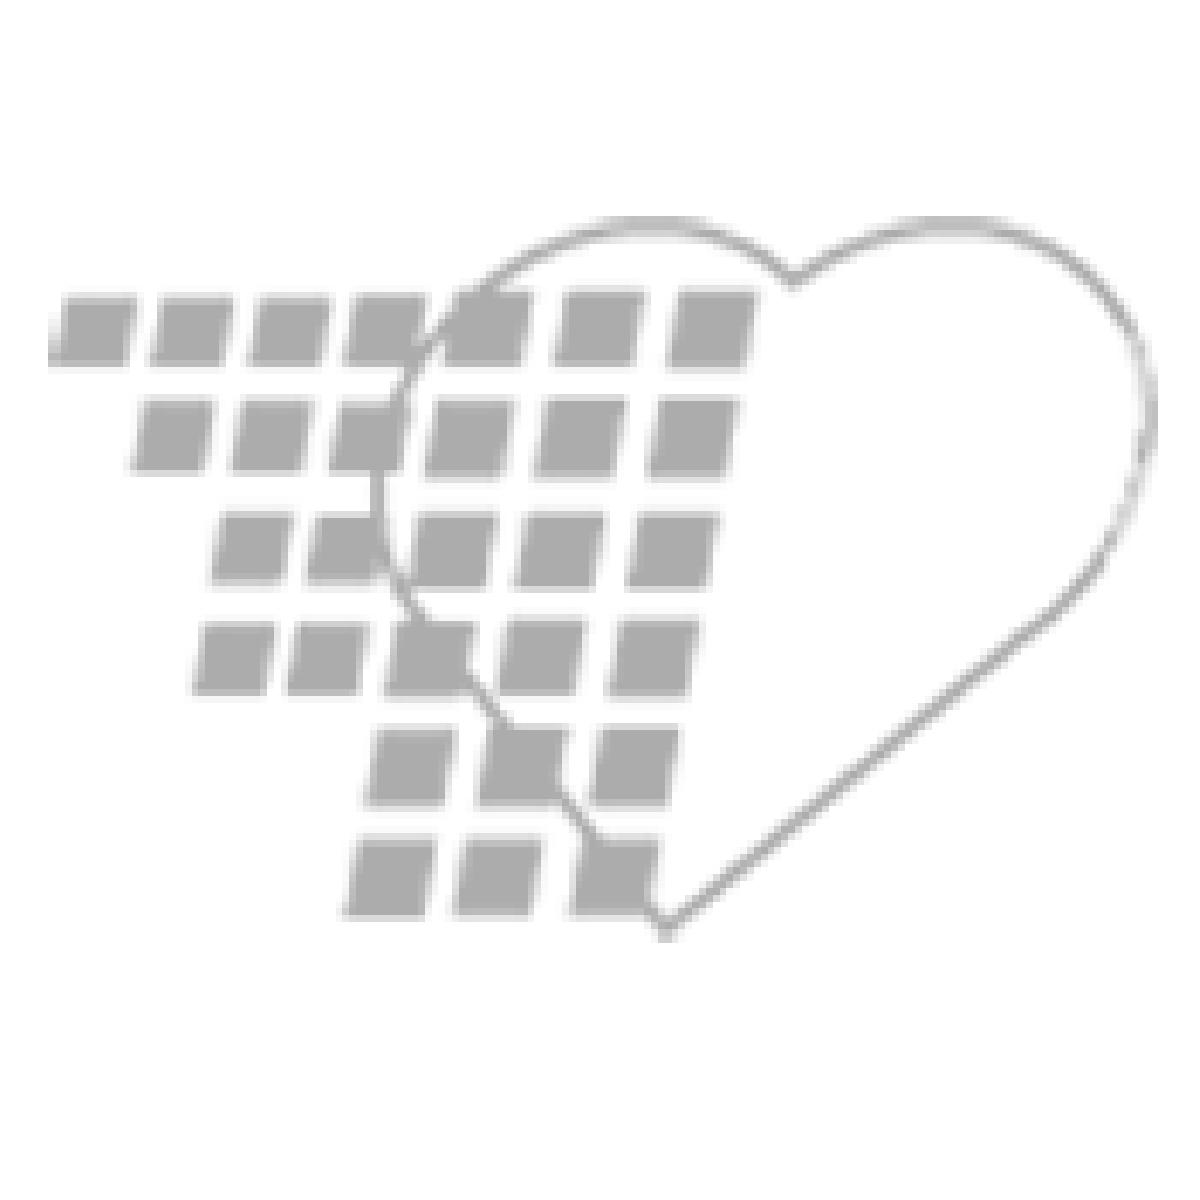 11-81-3012 Laerdal Resusci Anne QCPR AED - Full Body